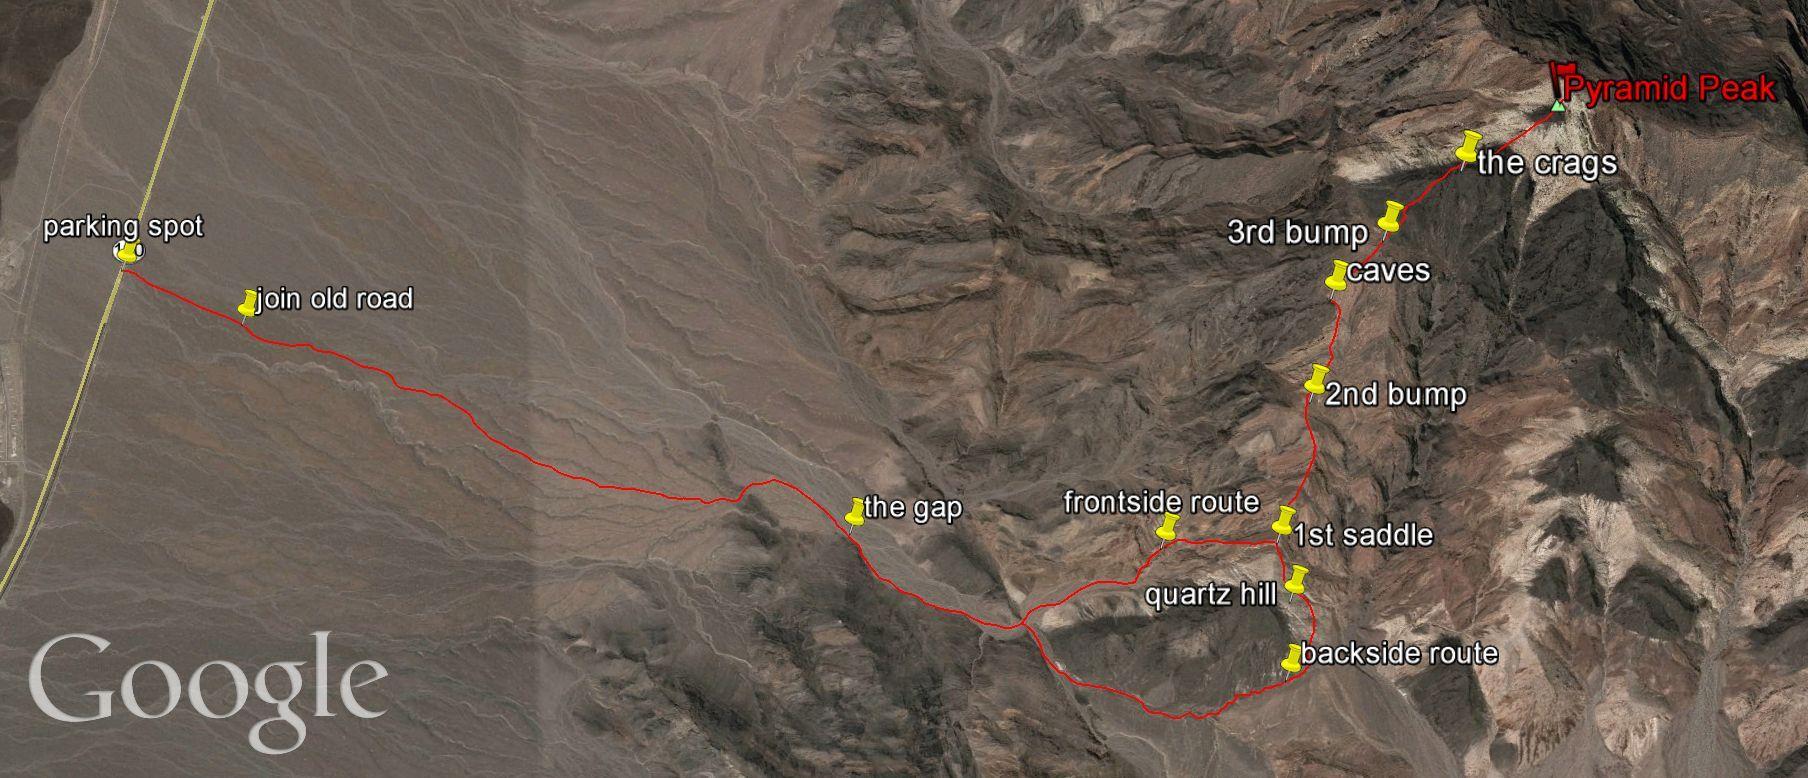 Pyramid Peak trail